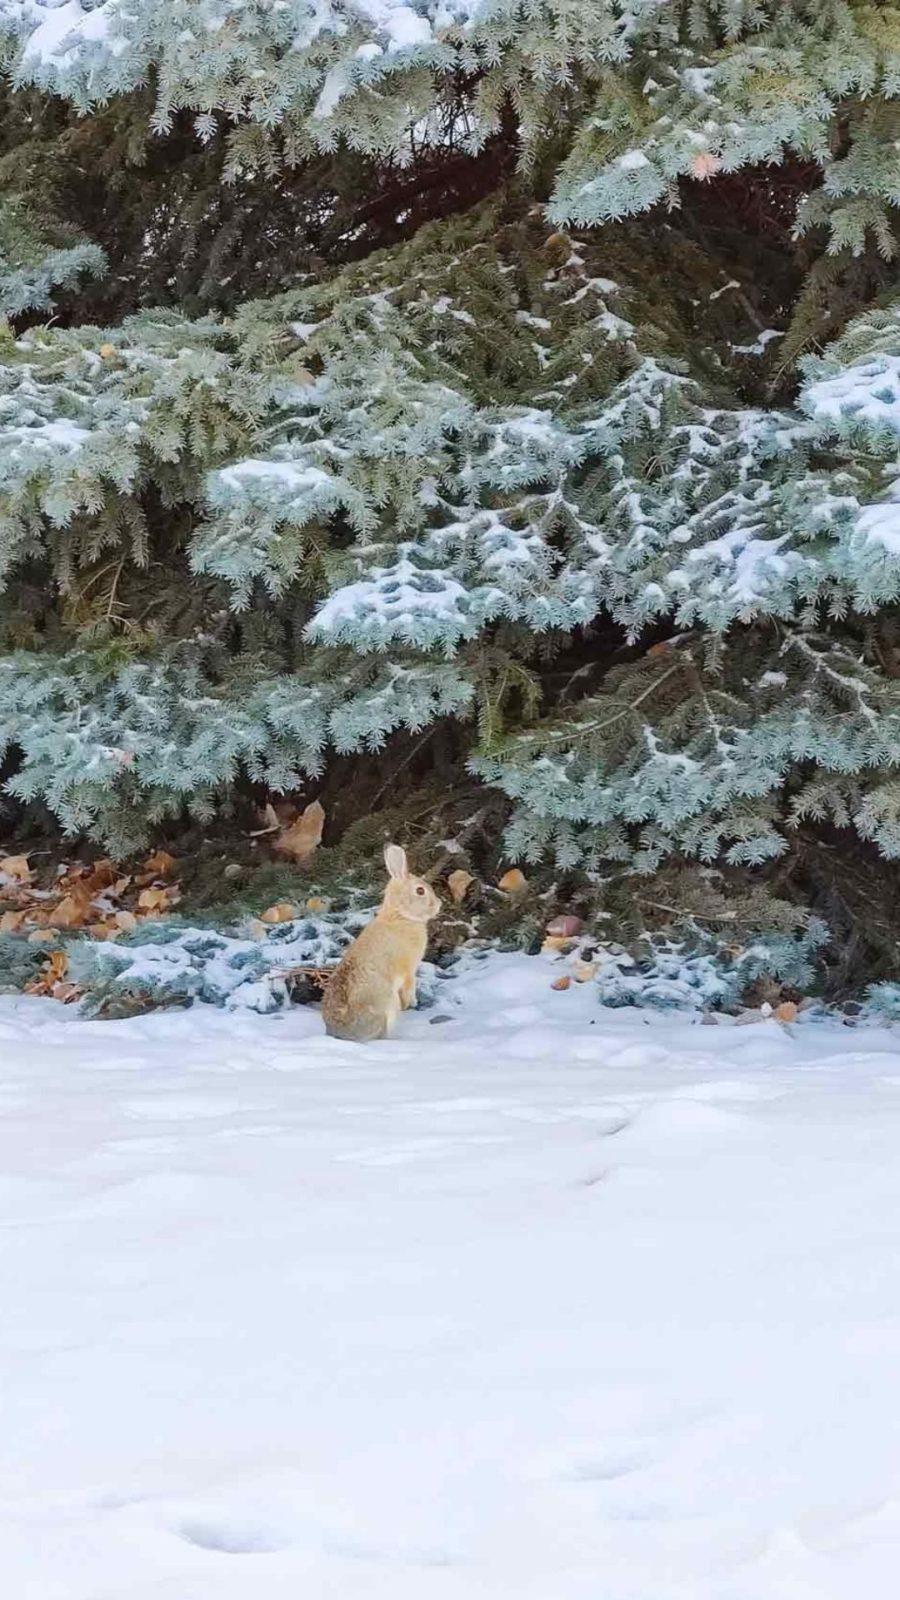 Fond ecran - Winter in Boulder